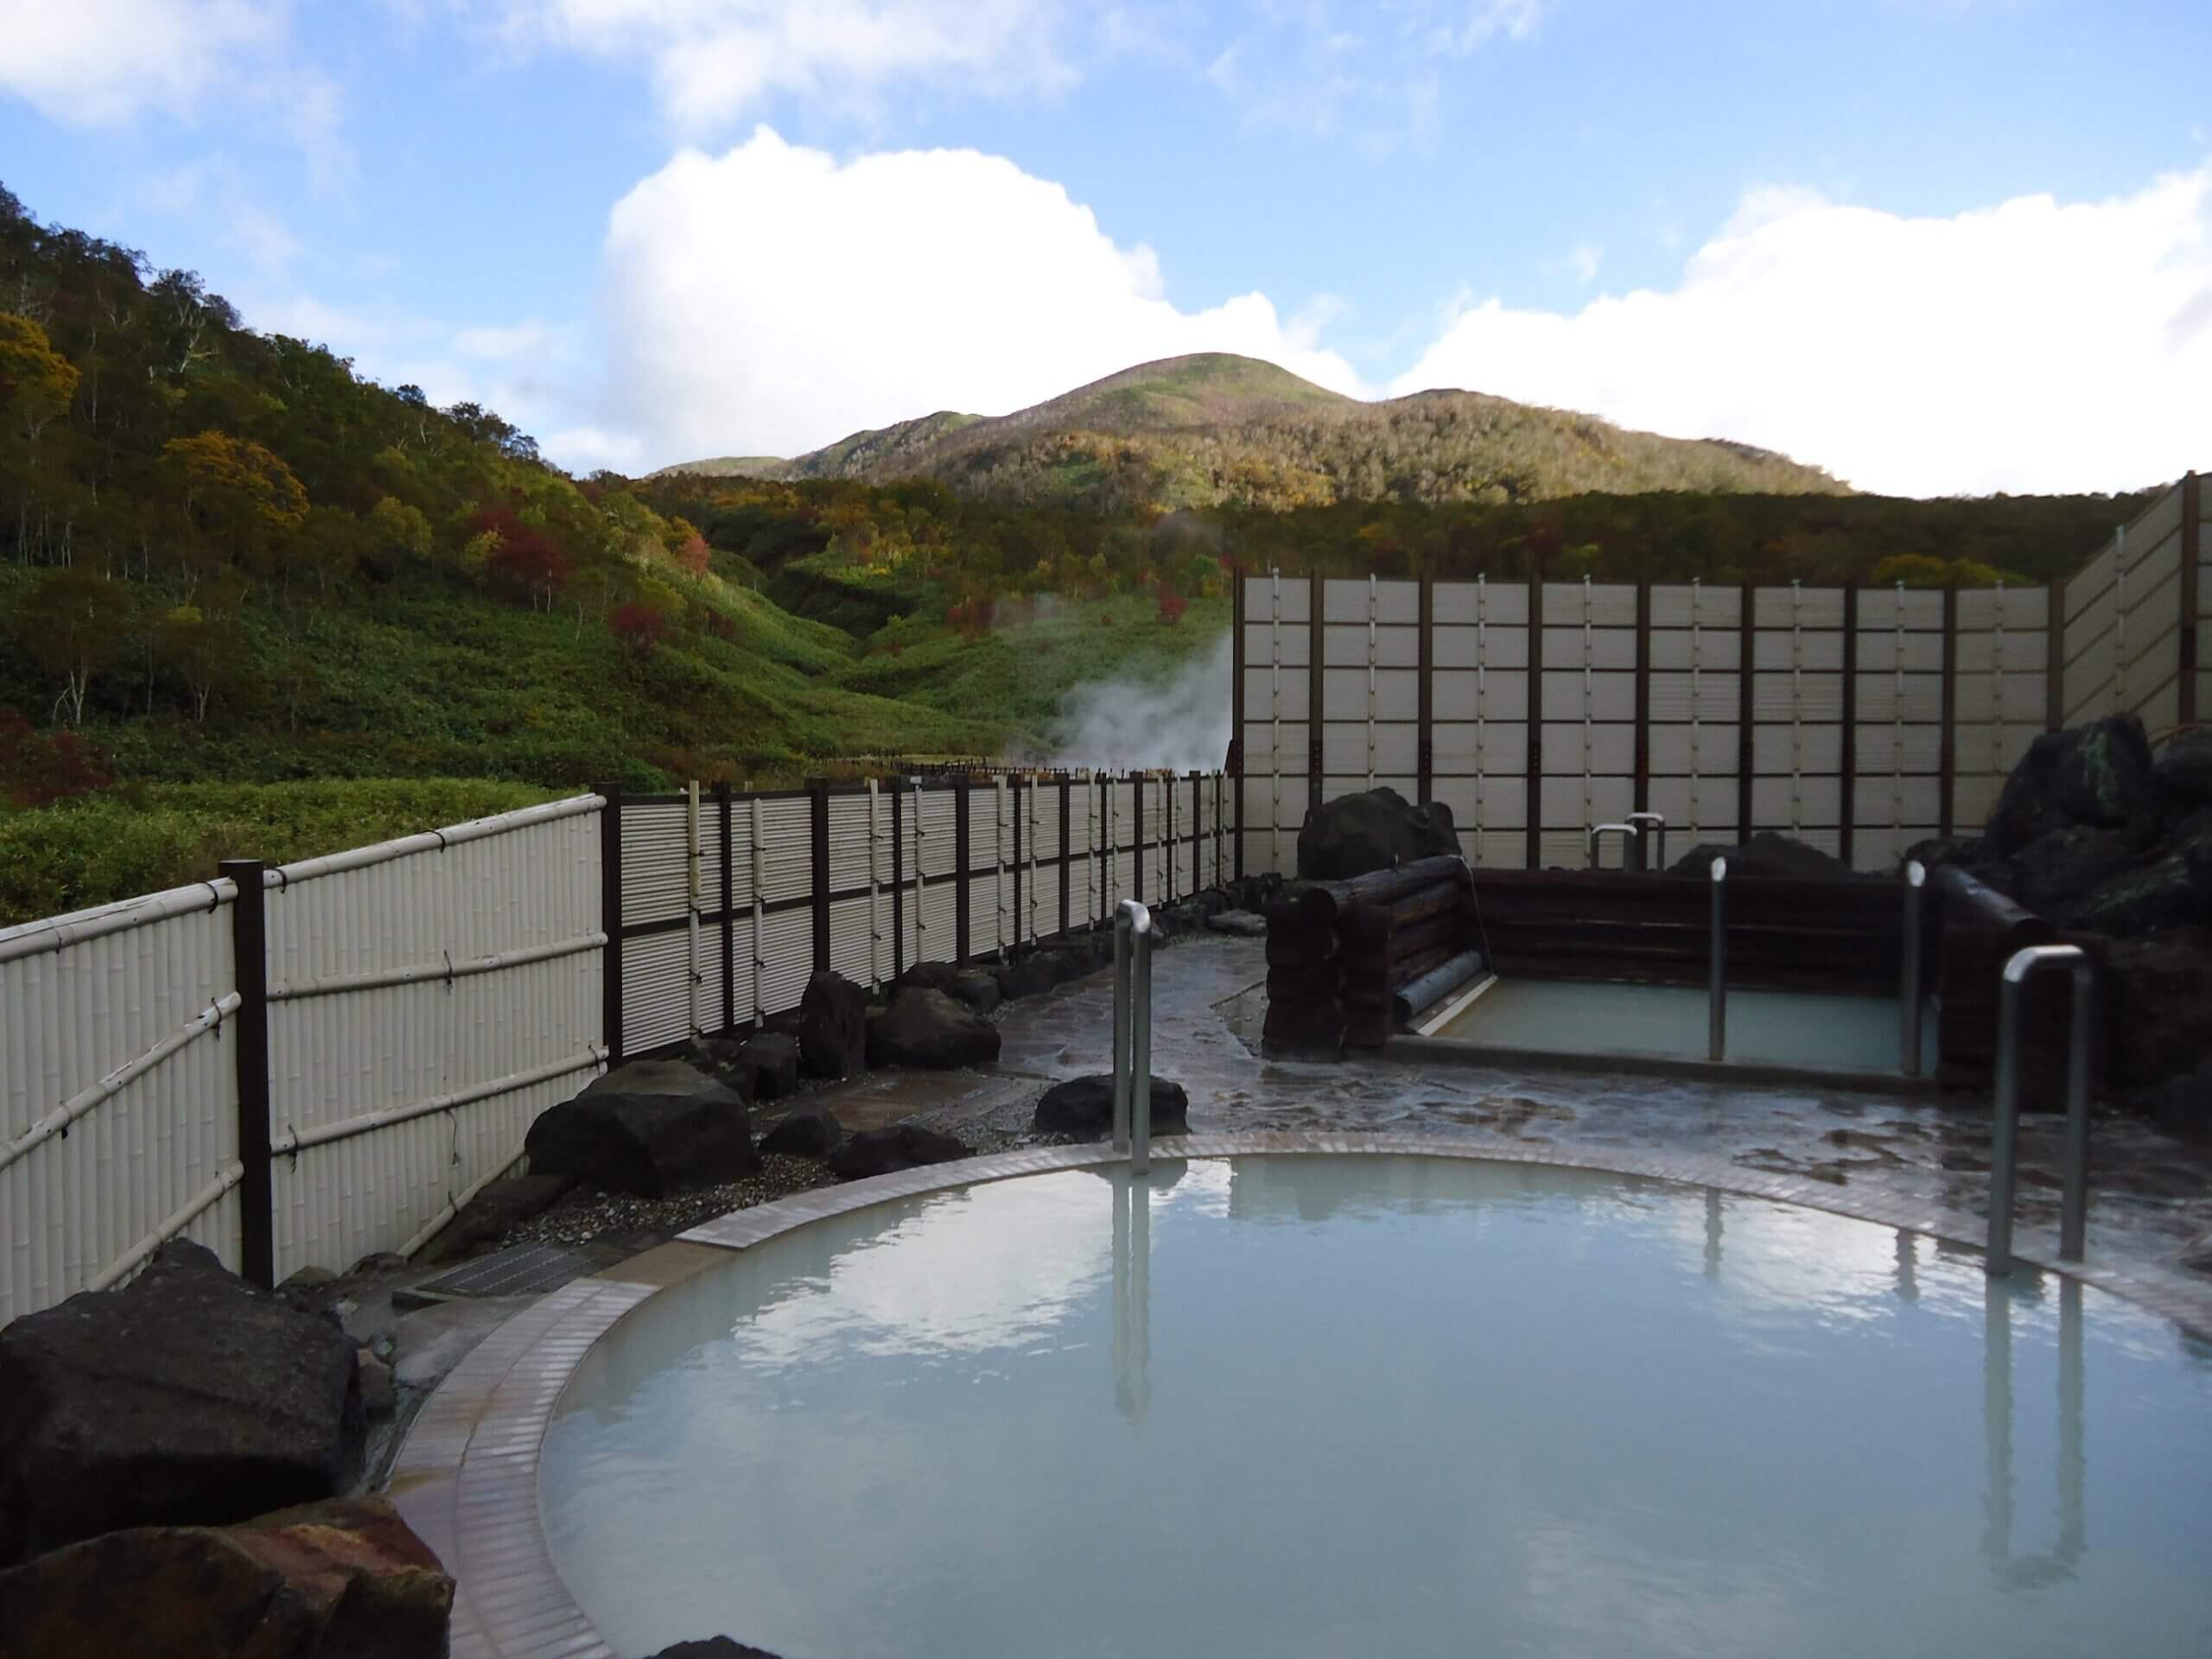 Yukichichibu Hot Springs: A Hidden Gem in the Mountains